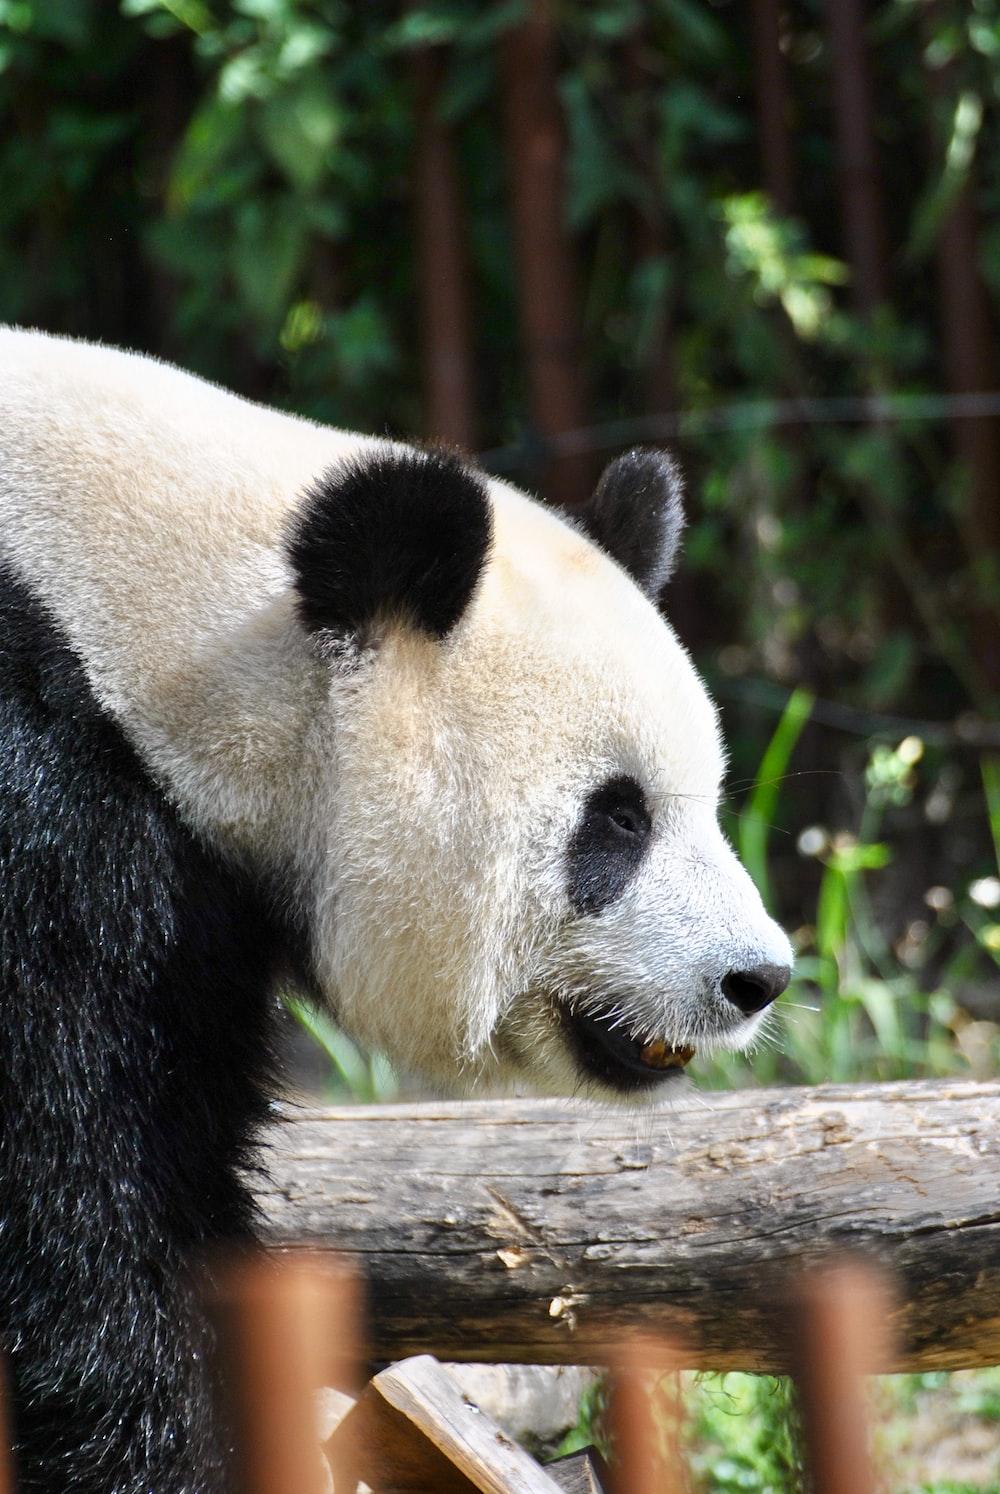 black and white panda bear near green plant